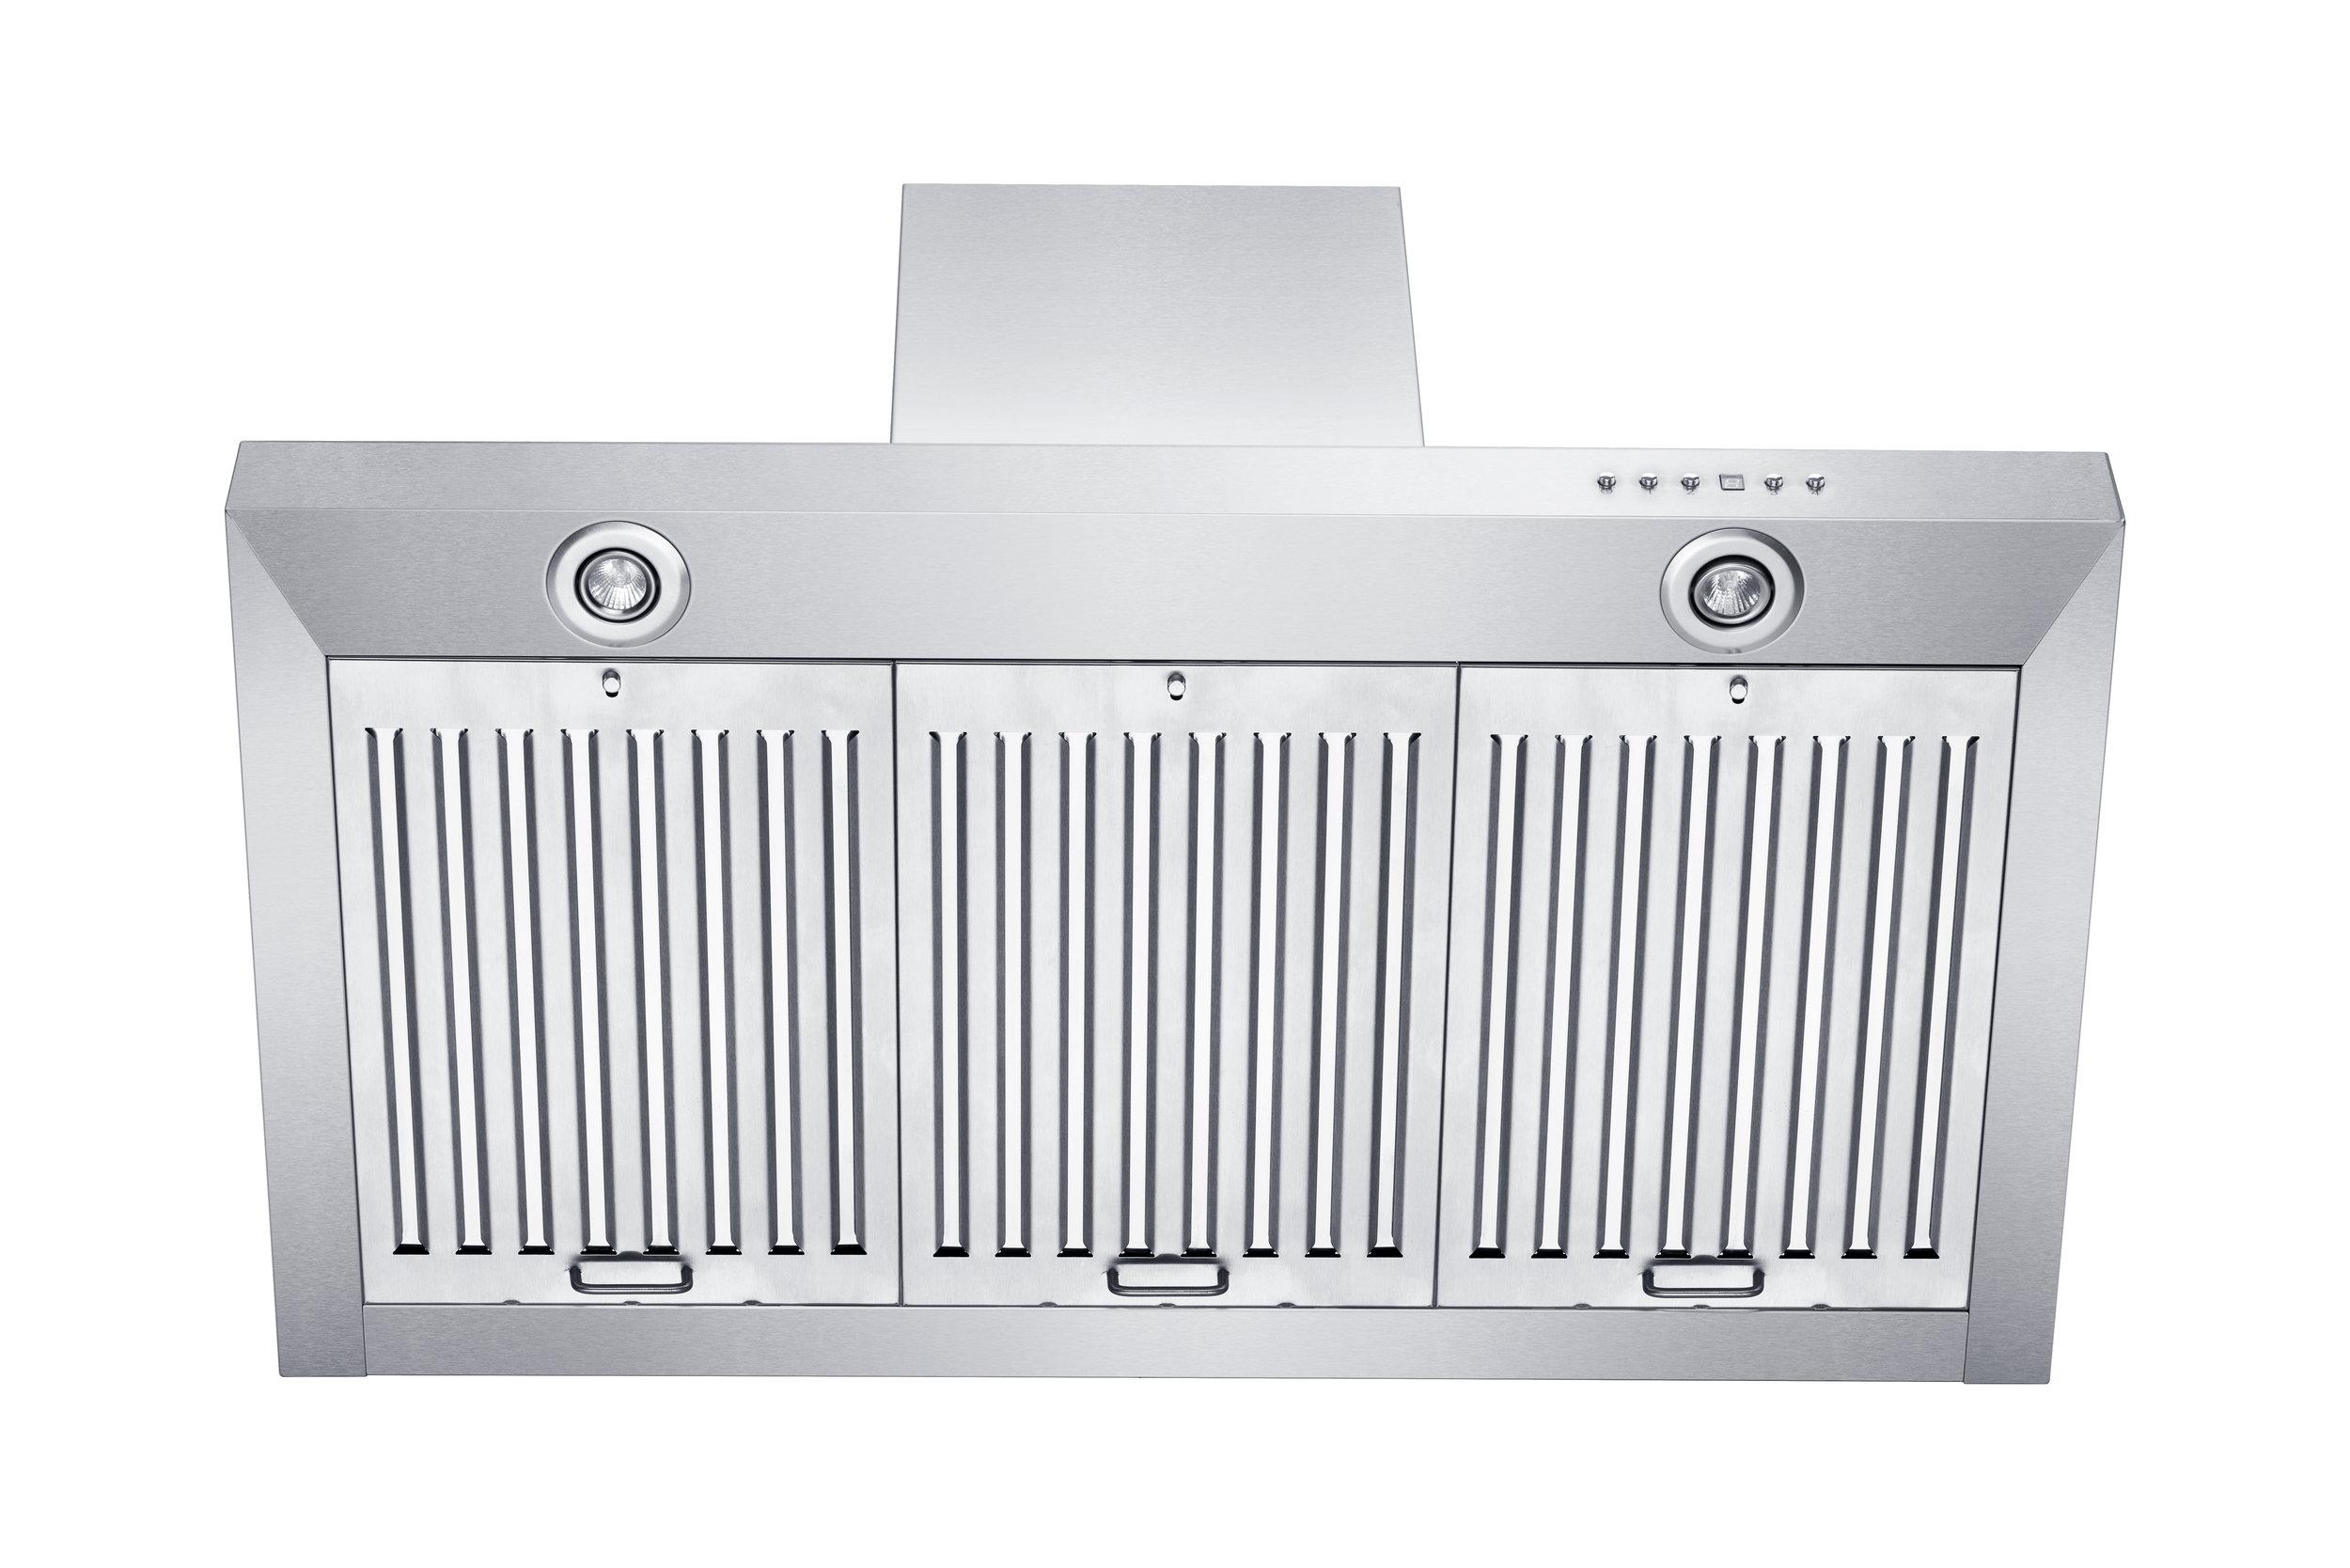 zline-stainless-steel-wall-mounted-range-hood-KE-new-bottom.jpg